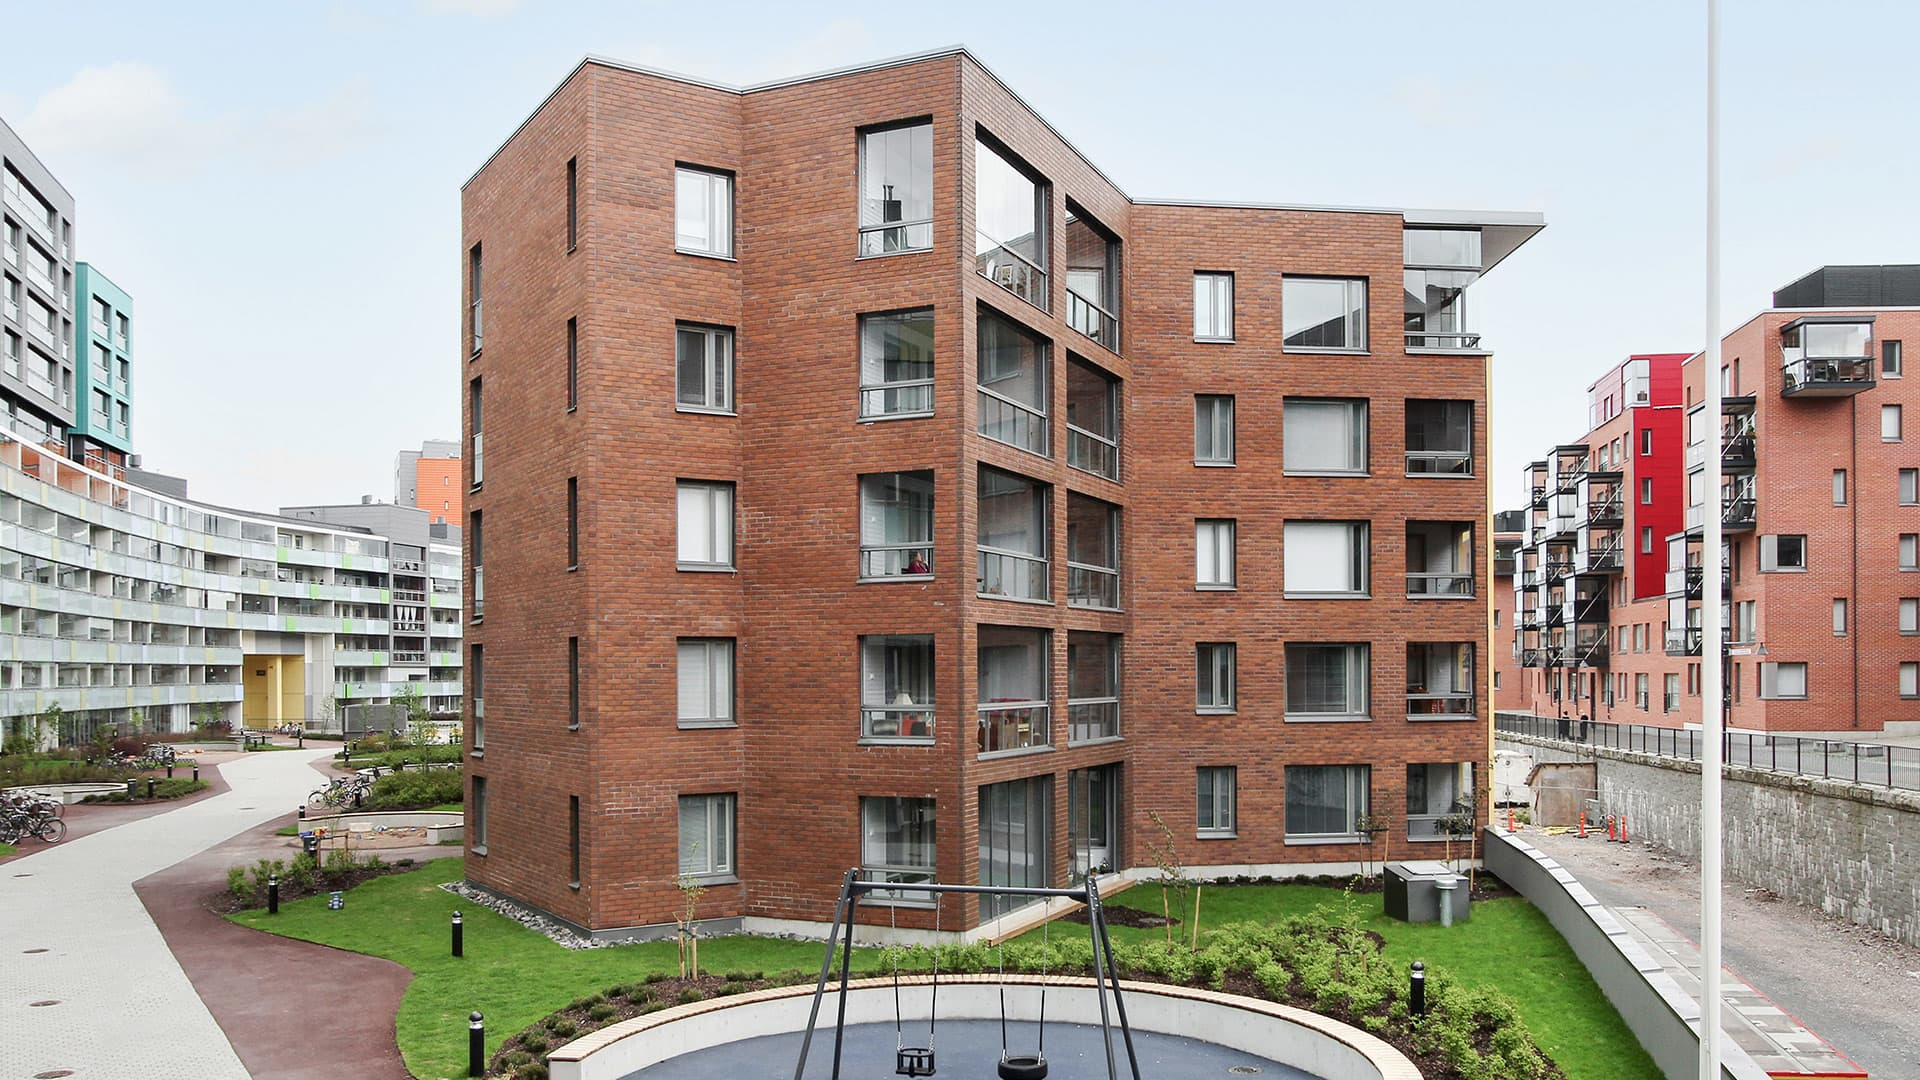 Myytävät asunnot Helsinki - Asunto Oy Helsingin Teodor, Vallilan Konepaja